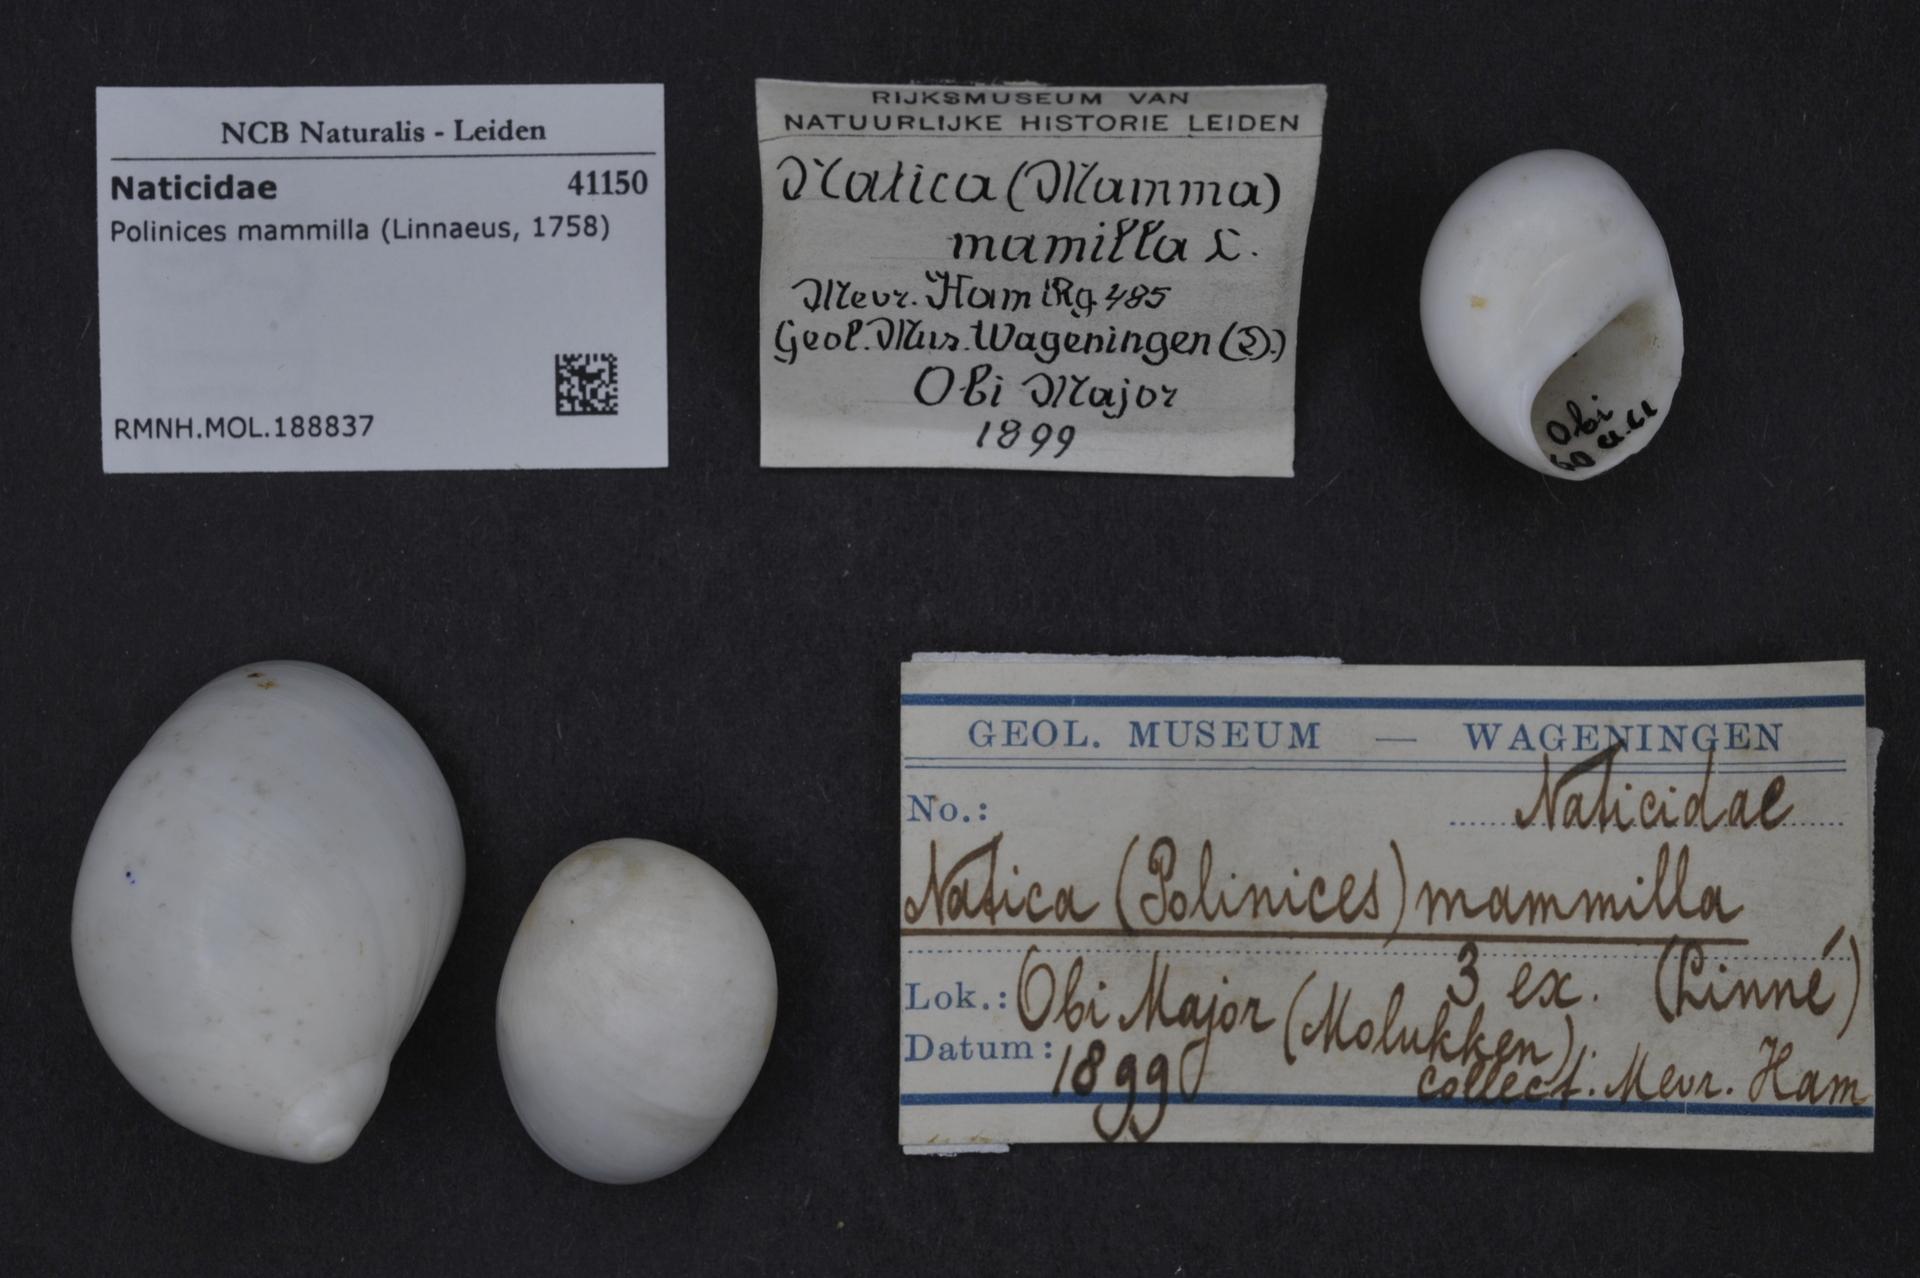 RMNH.MOL.188837 | Polinices mammilla (Linnaeus, 1758)